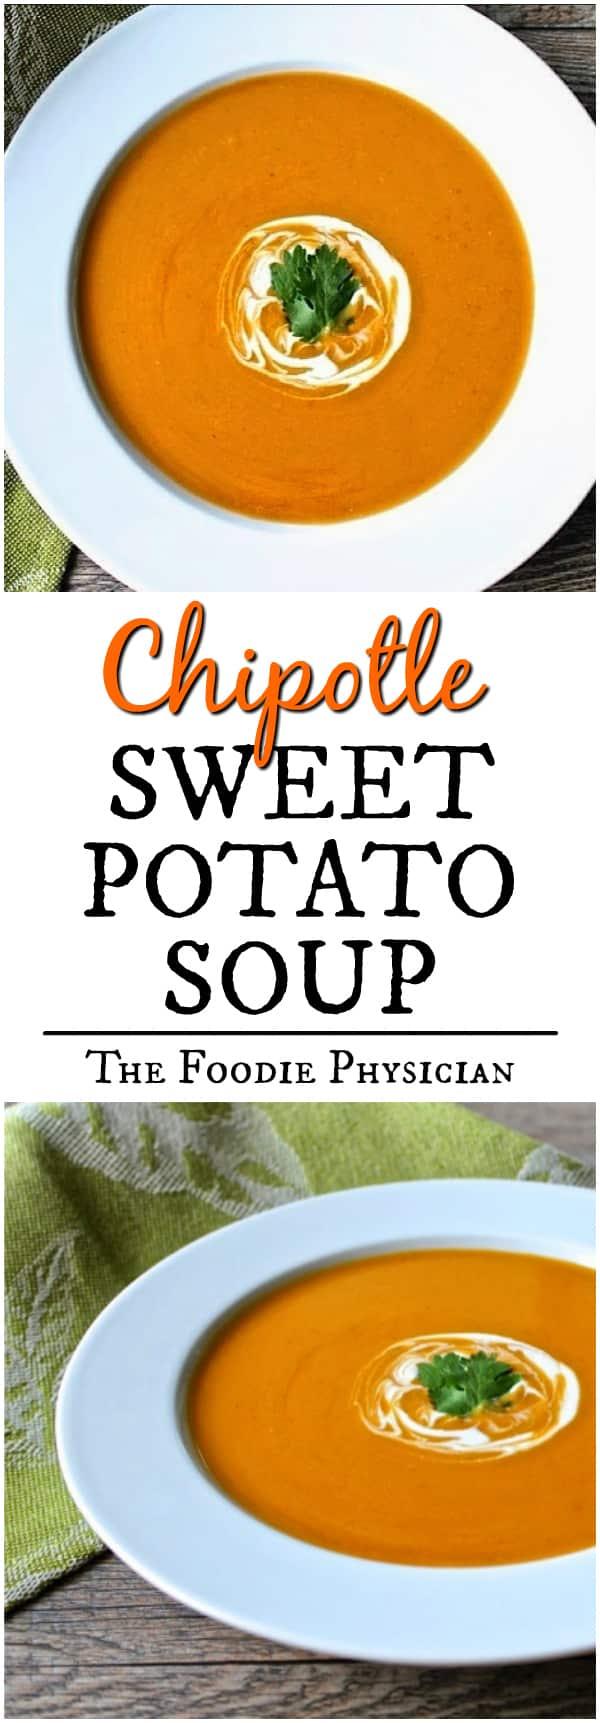 Chipotle Sweet Potato Soup | @foodiephysician